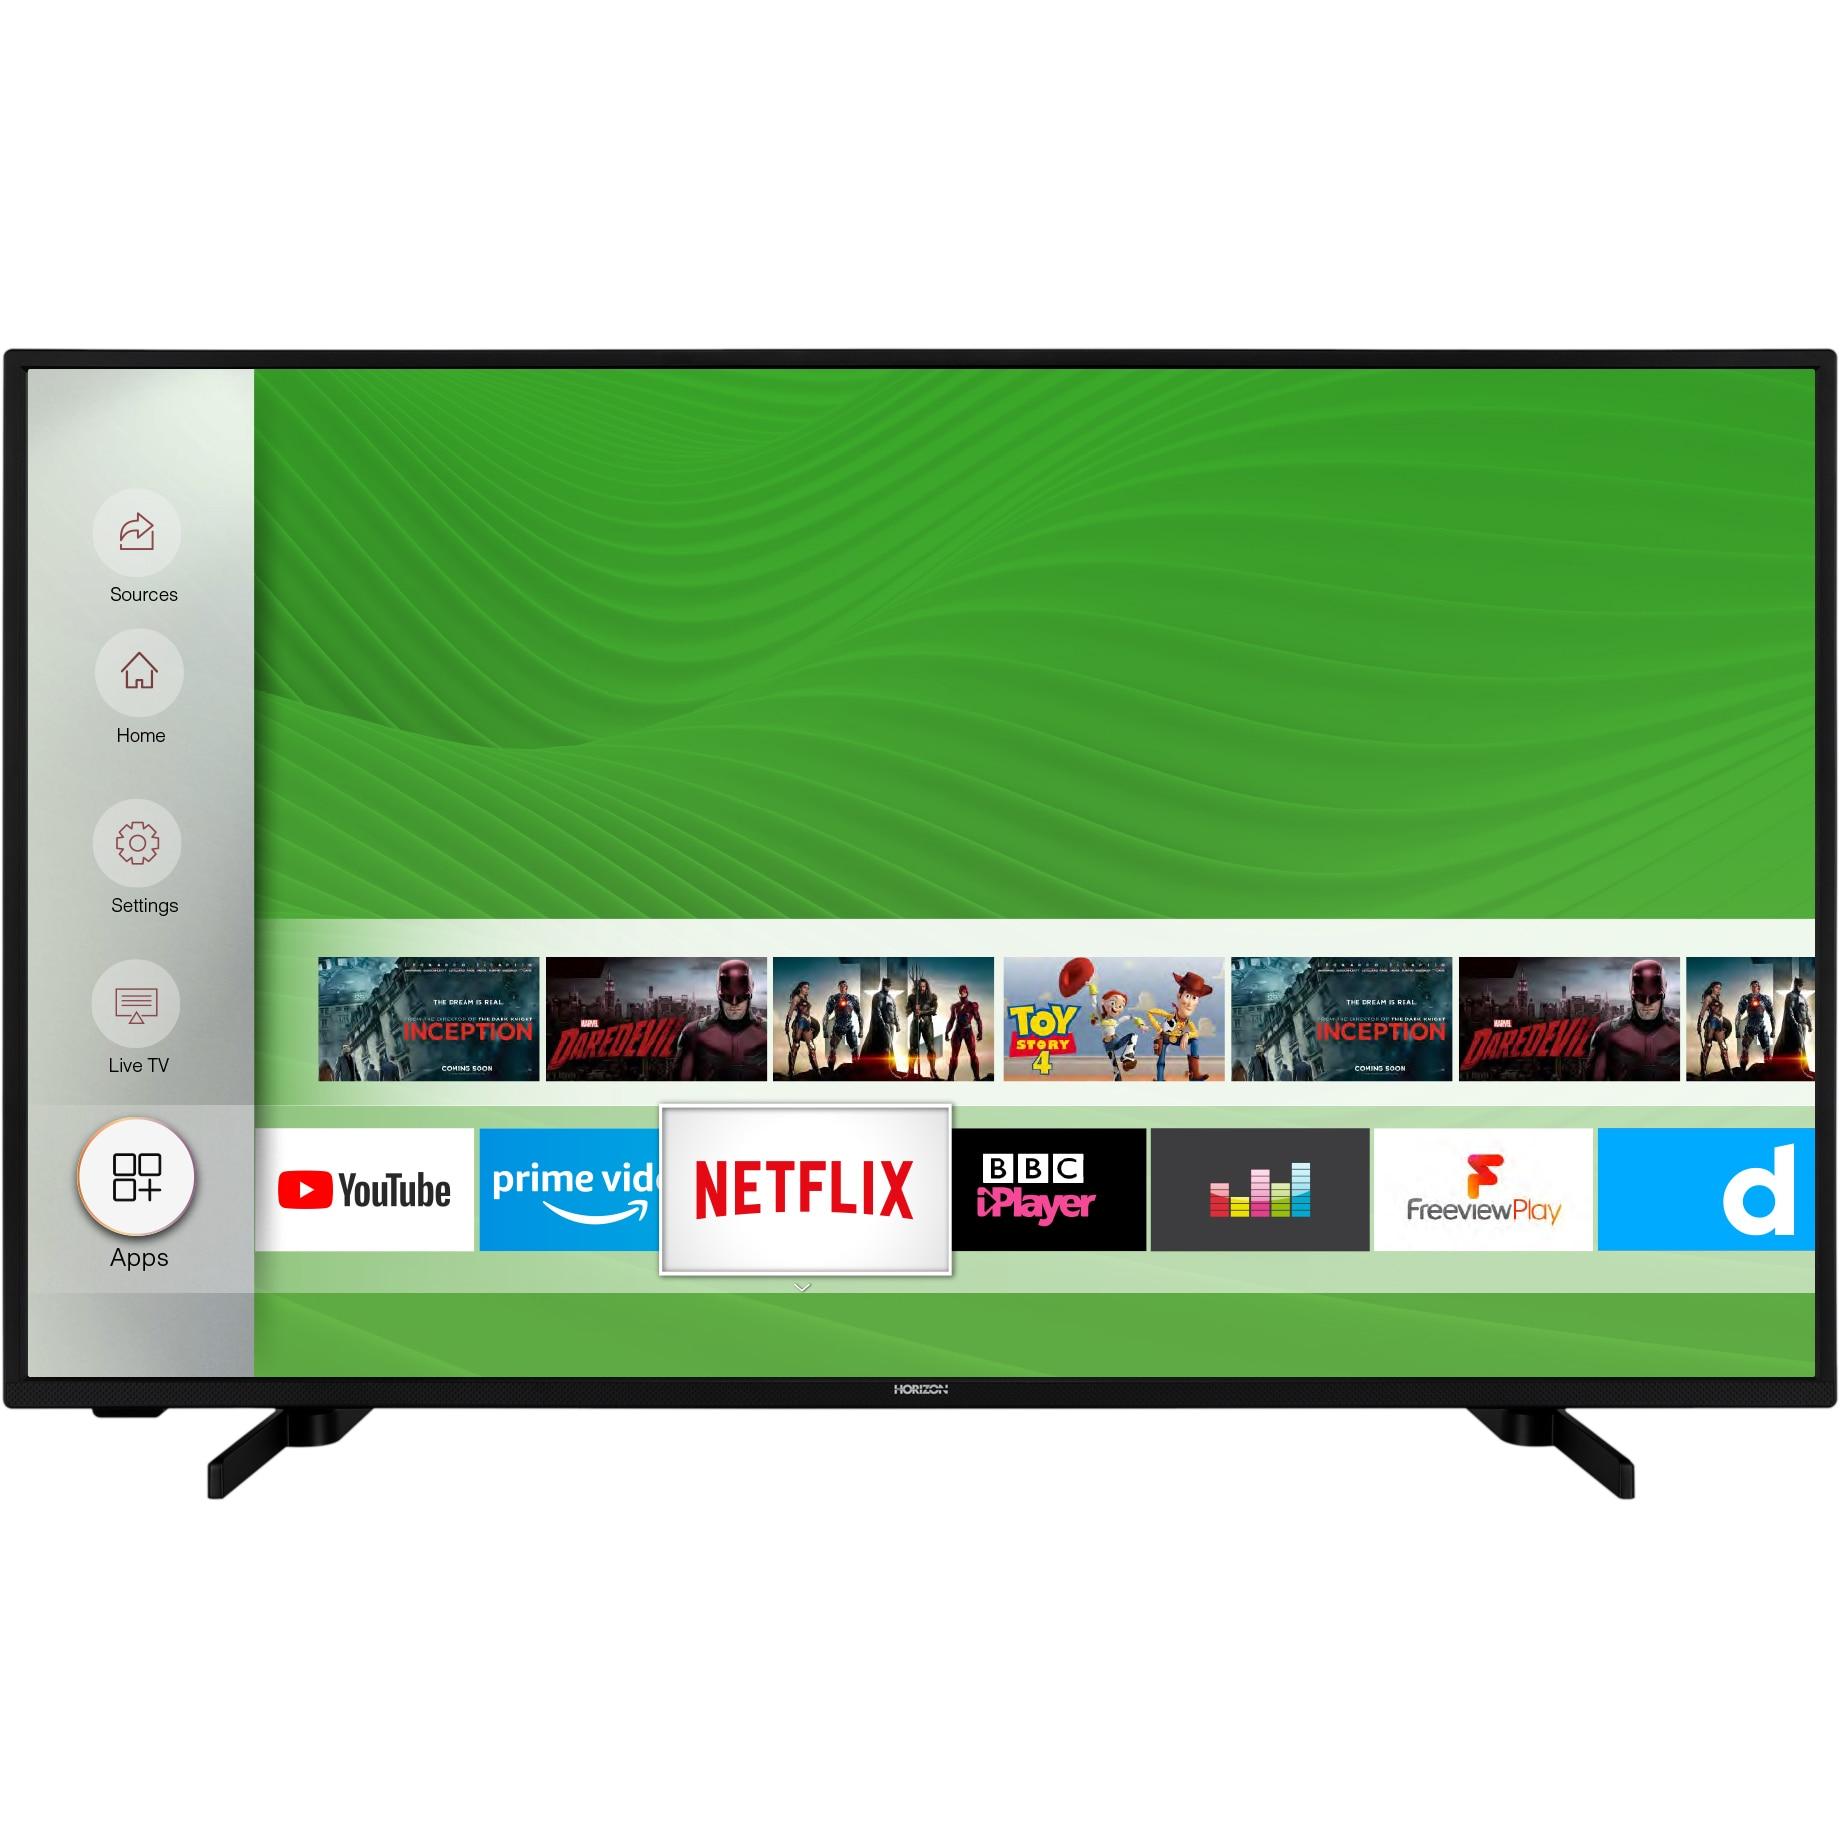 Fotografie Televizor Horizon 43HL7530U, 108 cm, Smart, 4K Ultra HD, LED, Clasa A+